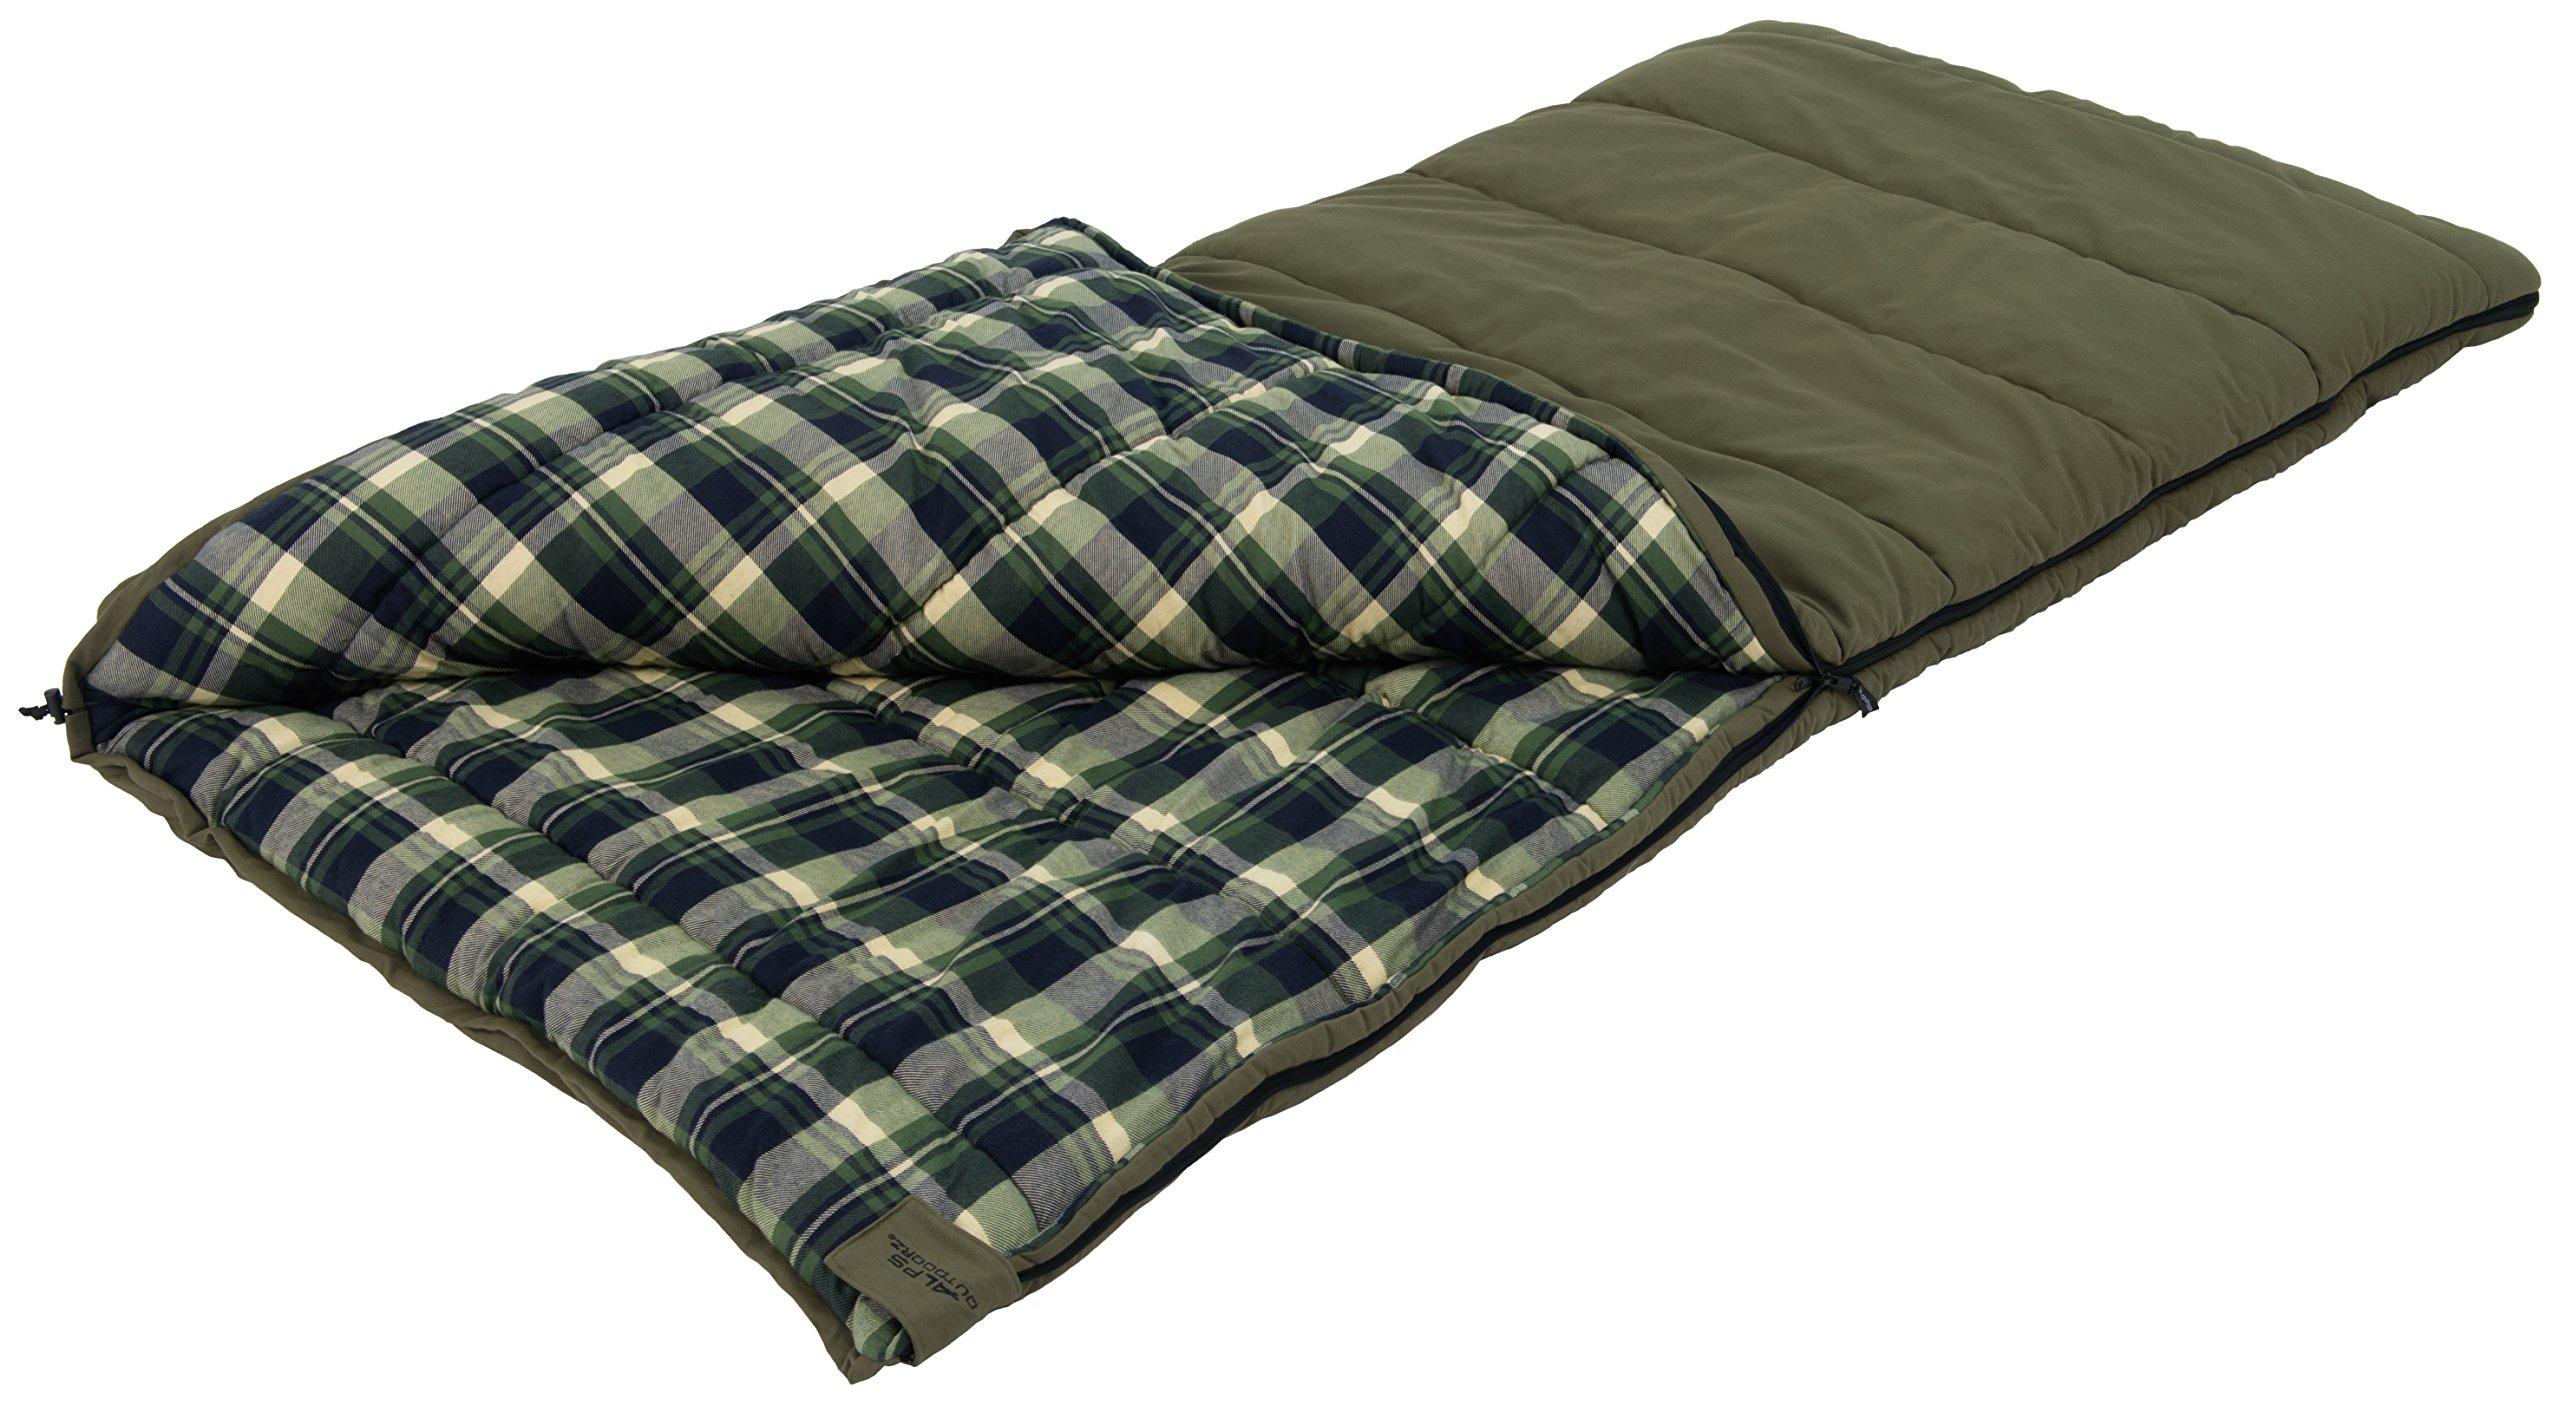 ALPS OutdoorZ Redwood -10 Degree Flannel Sleeping Bag 3